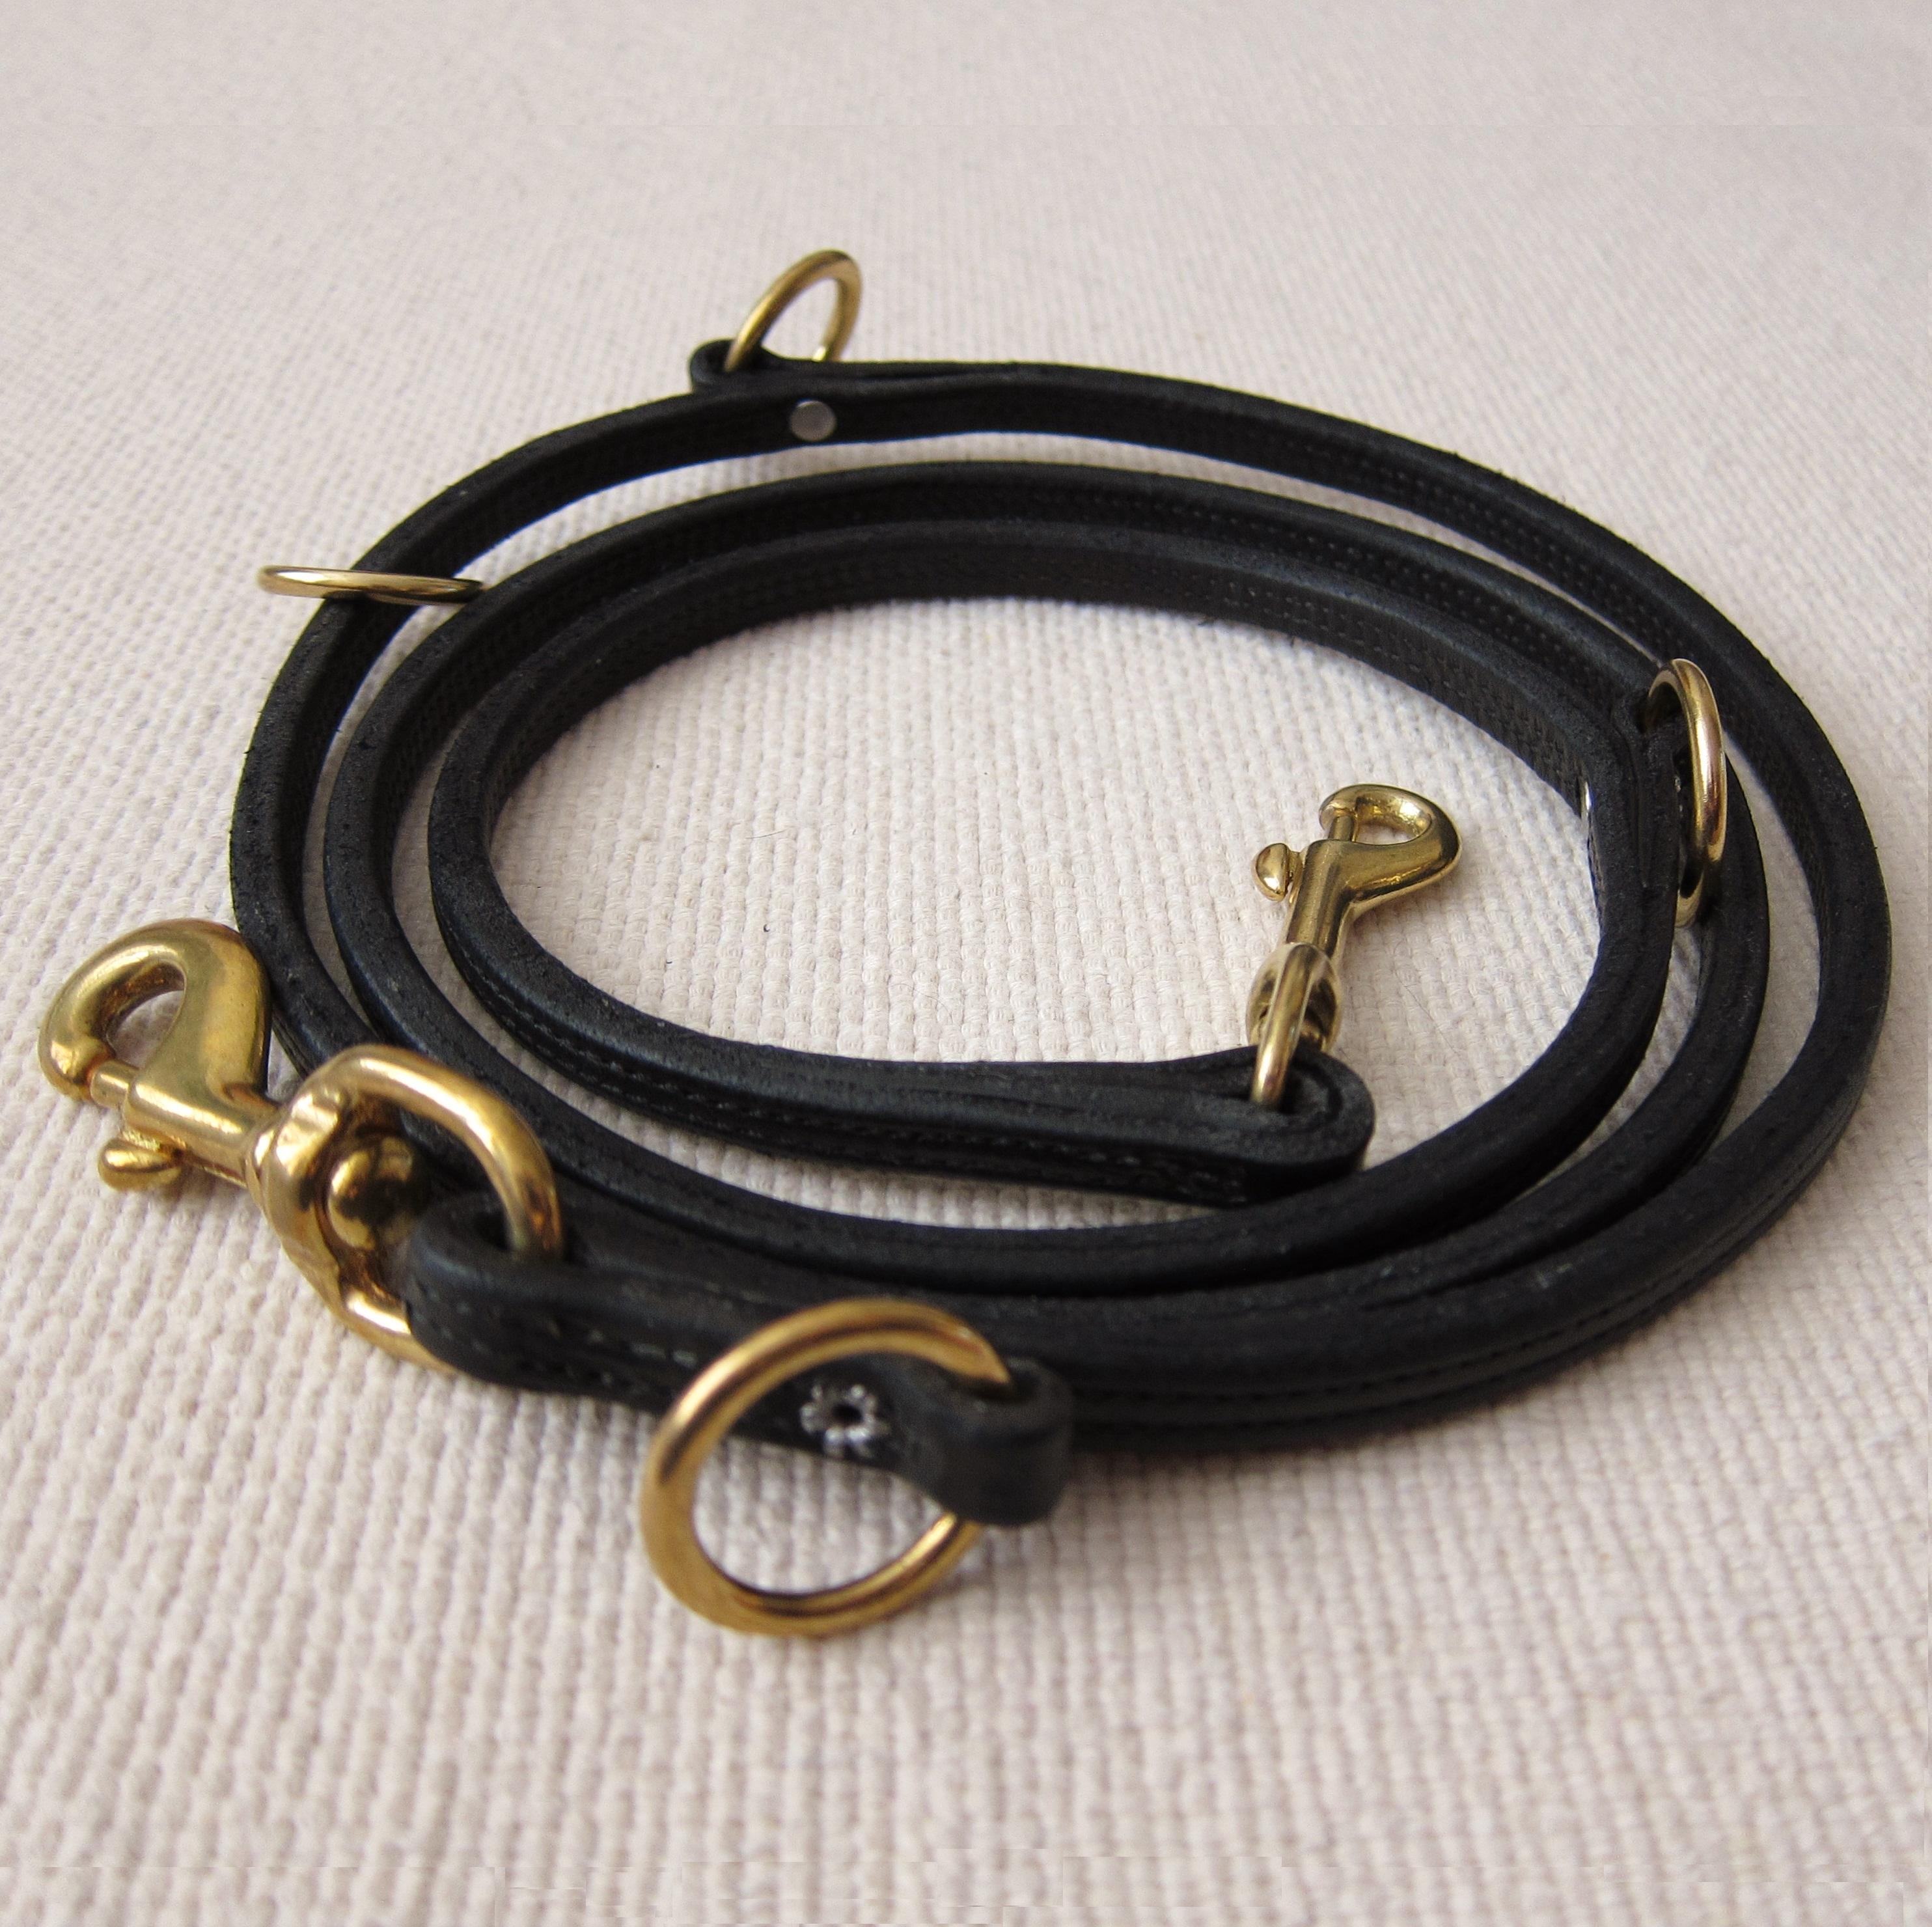 police leash, tactical leash, dog leash, tactical dog leash, dog training leash, TEAM-K9